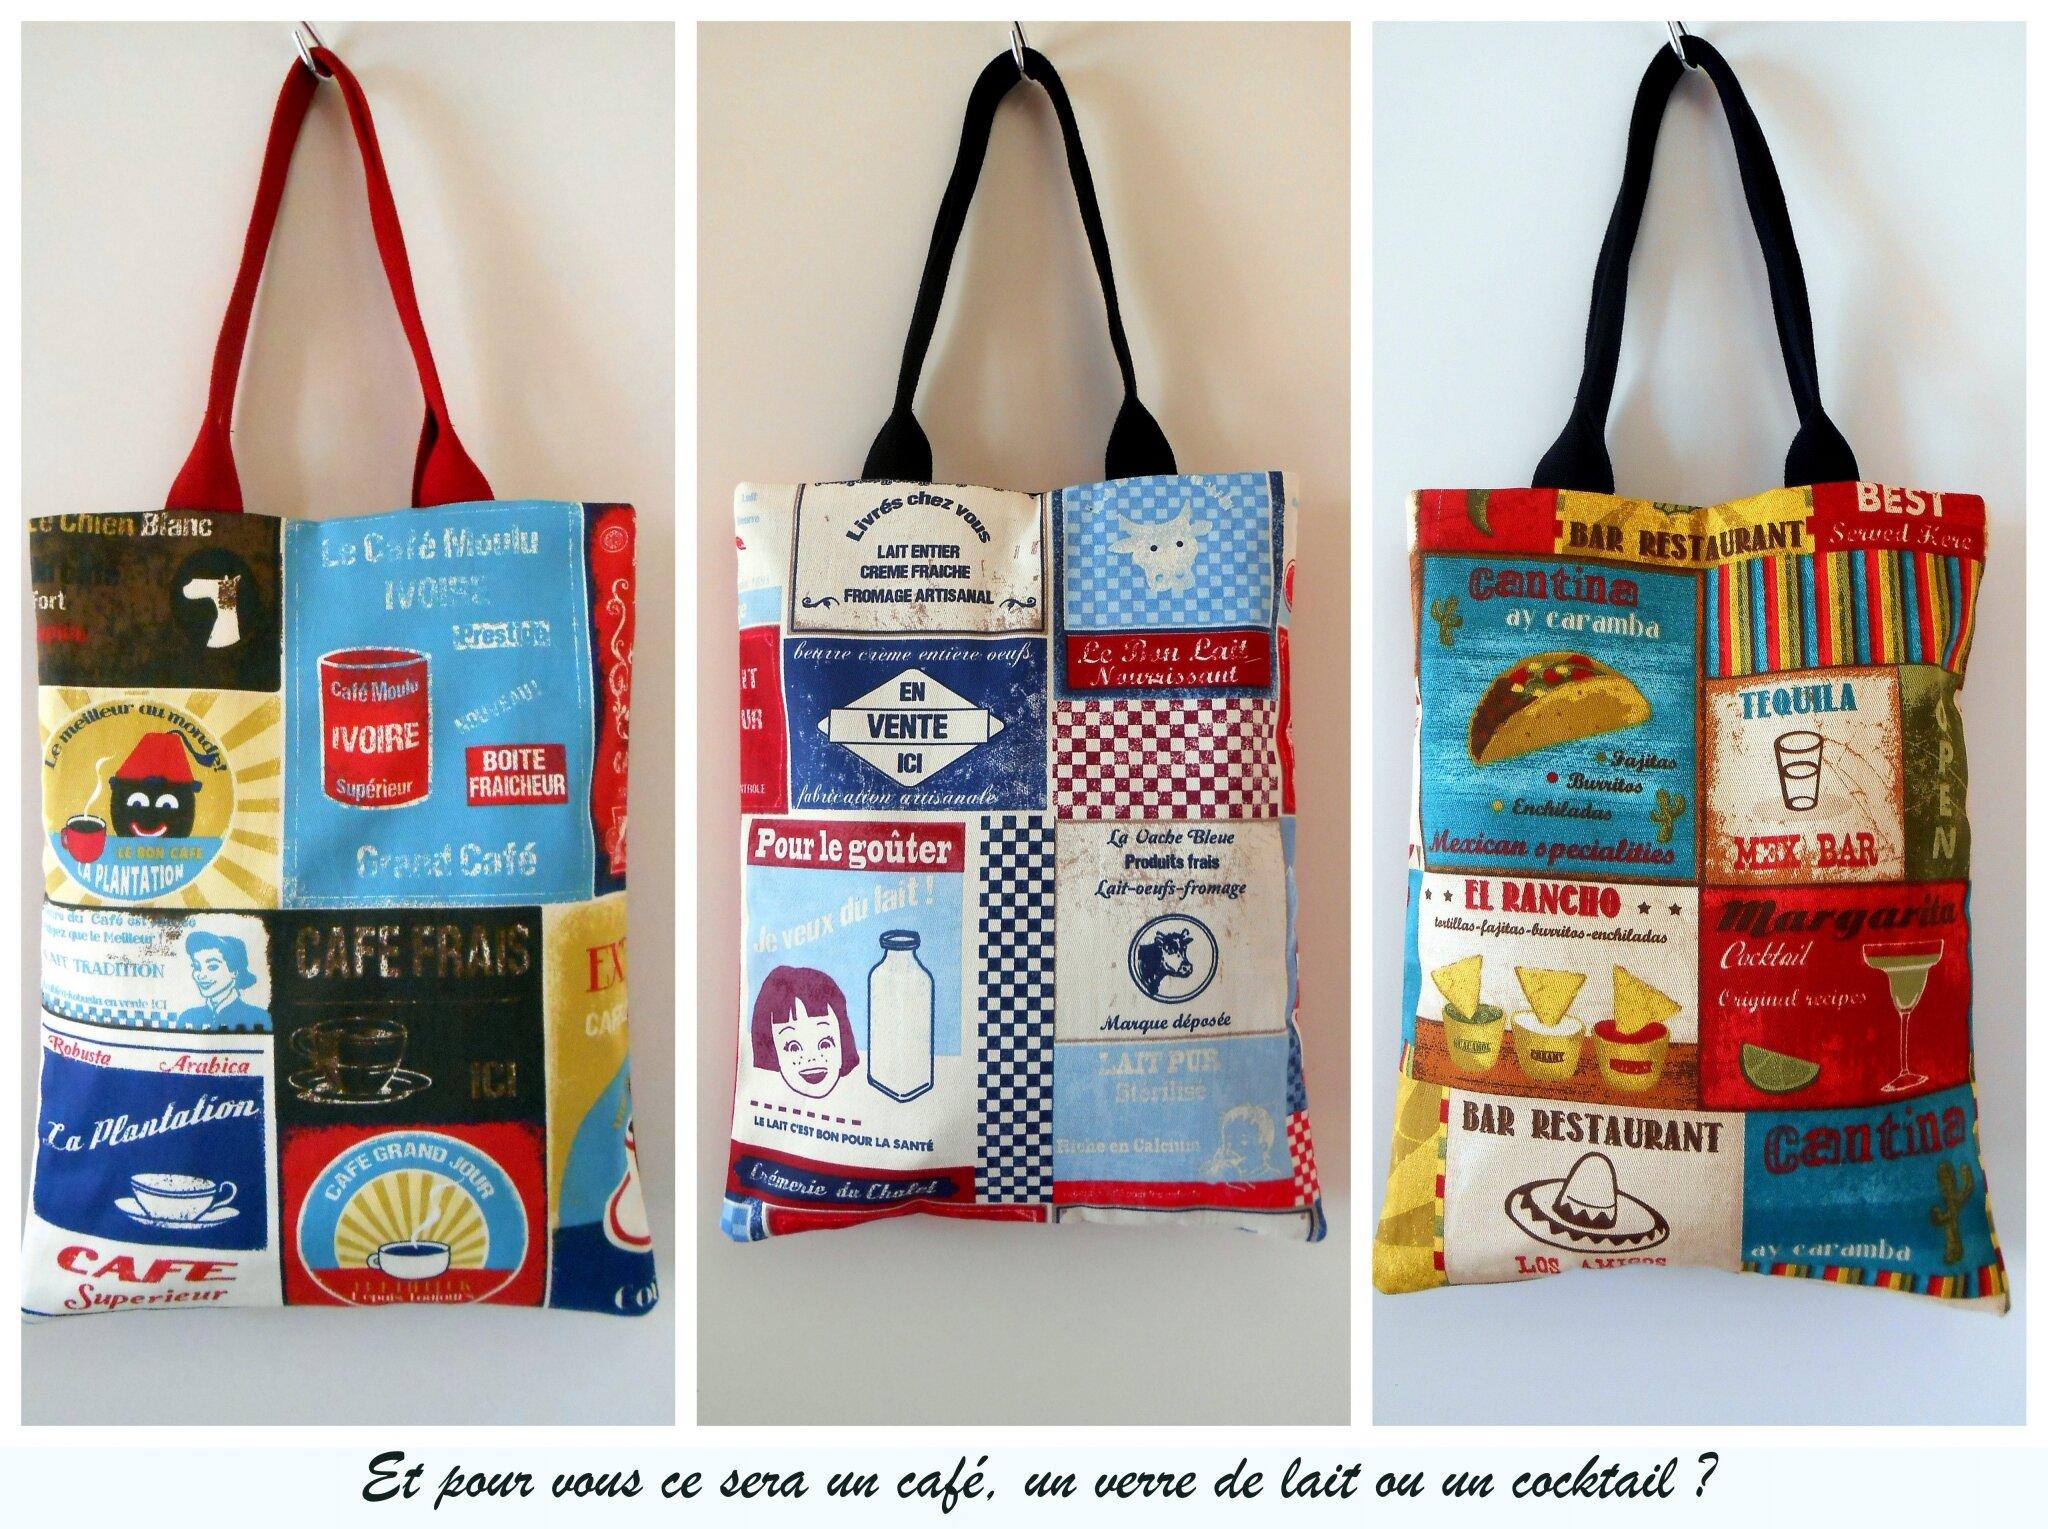 Connu Le sac cabas fait sa pub - clocreations EL32